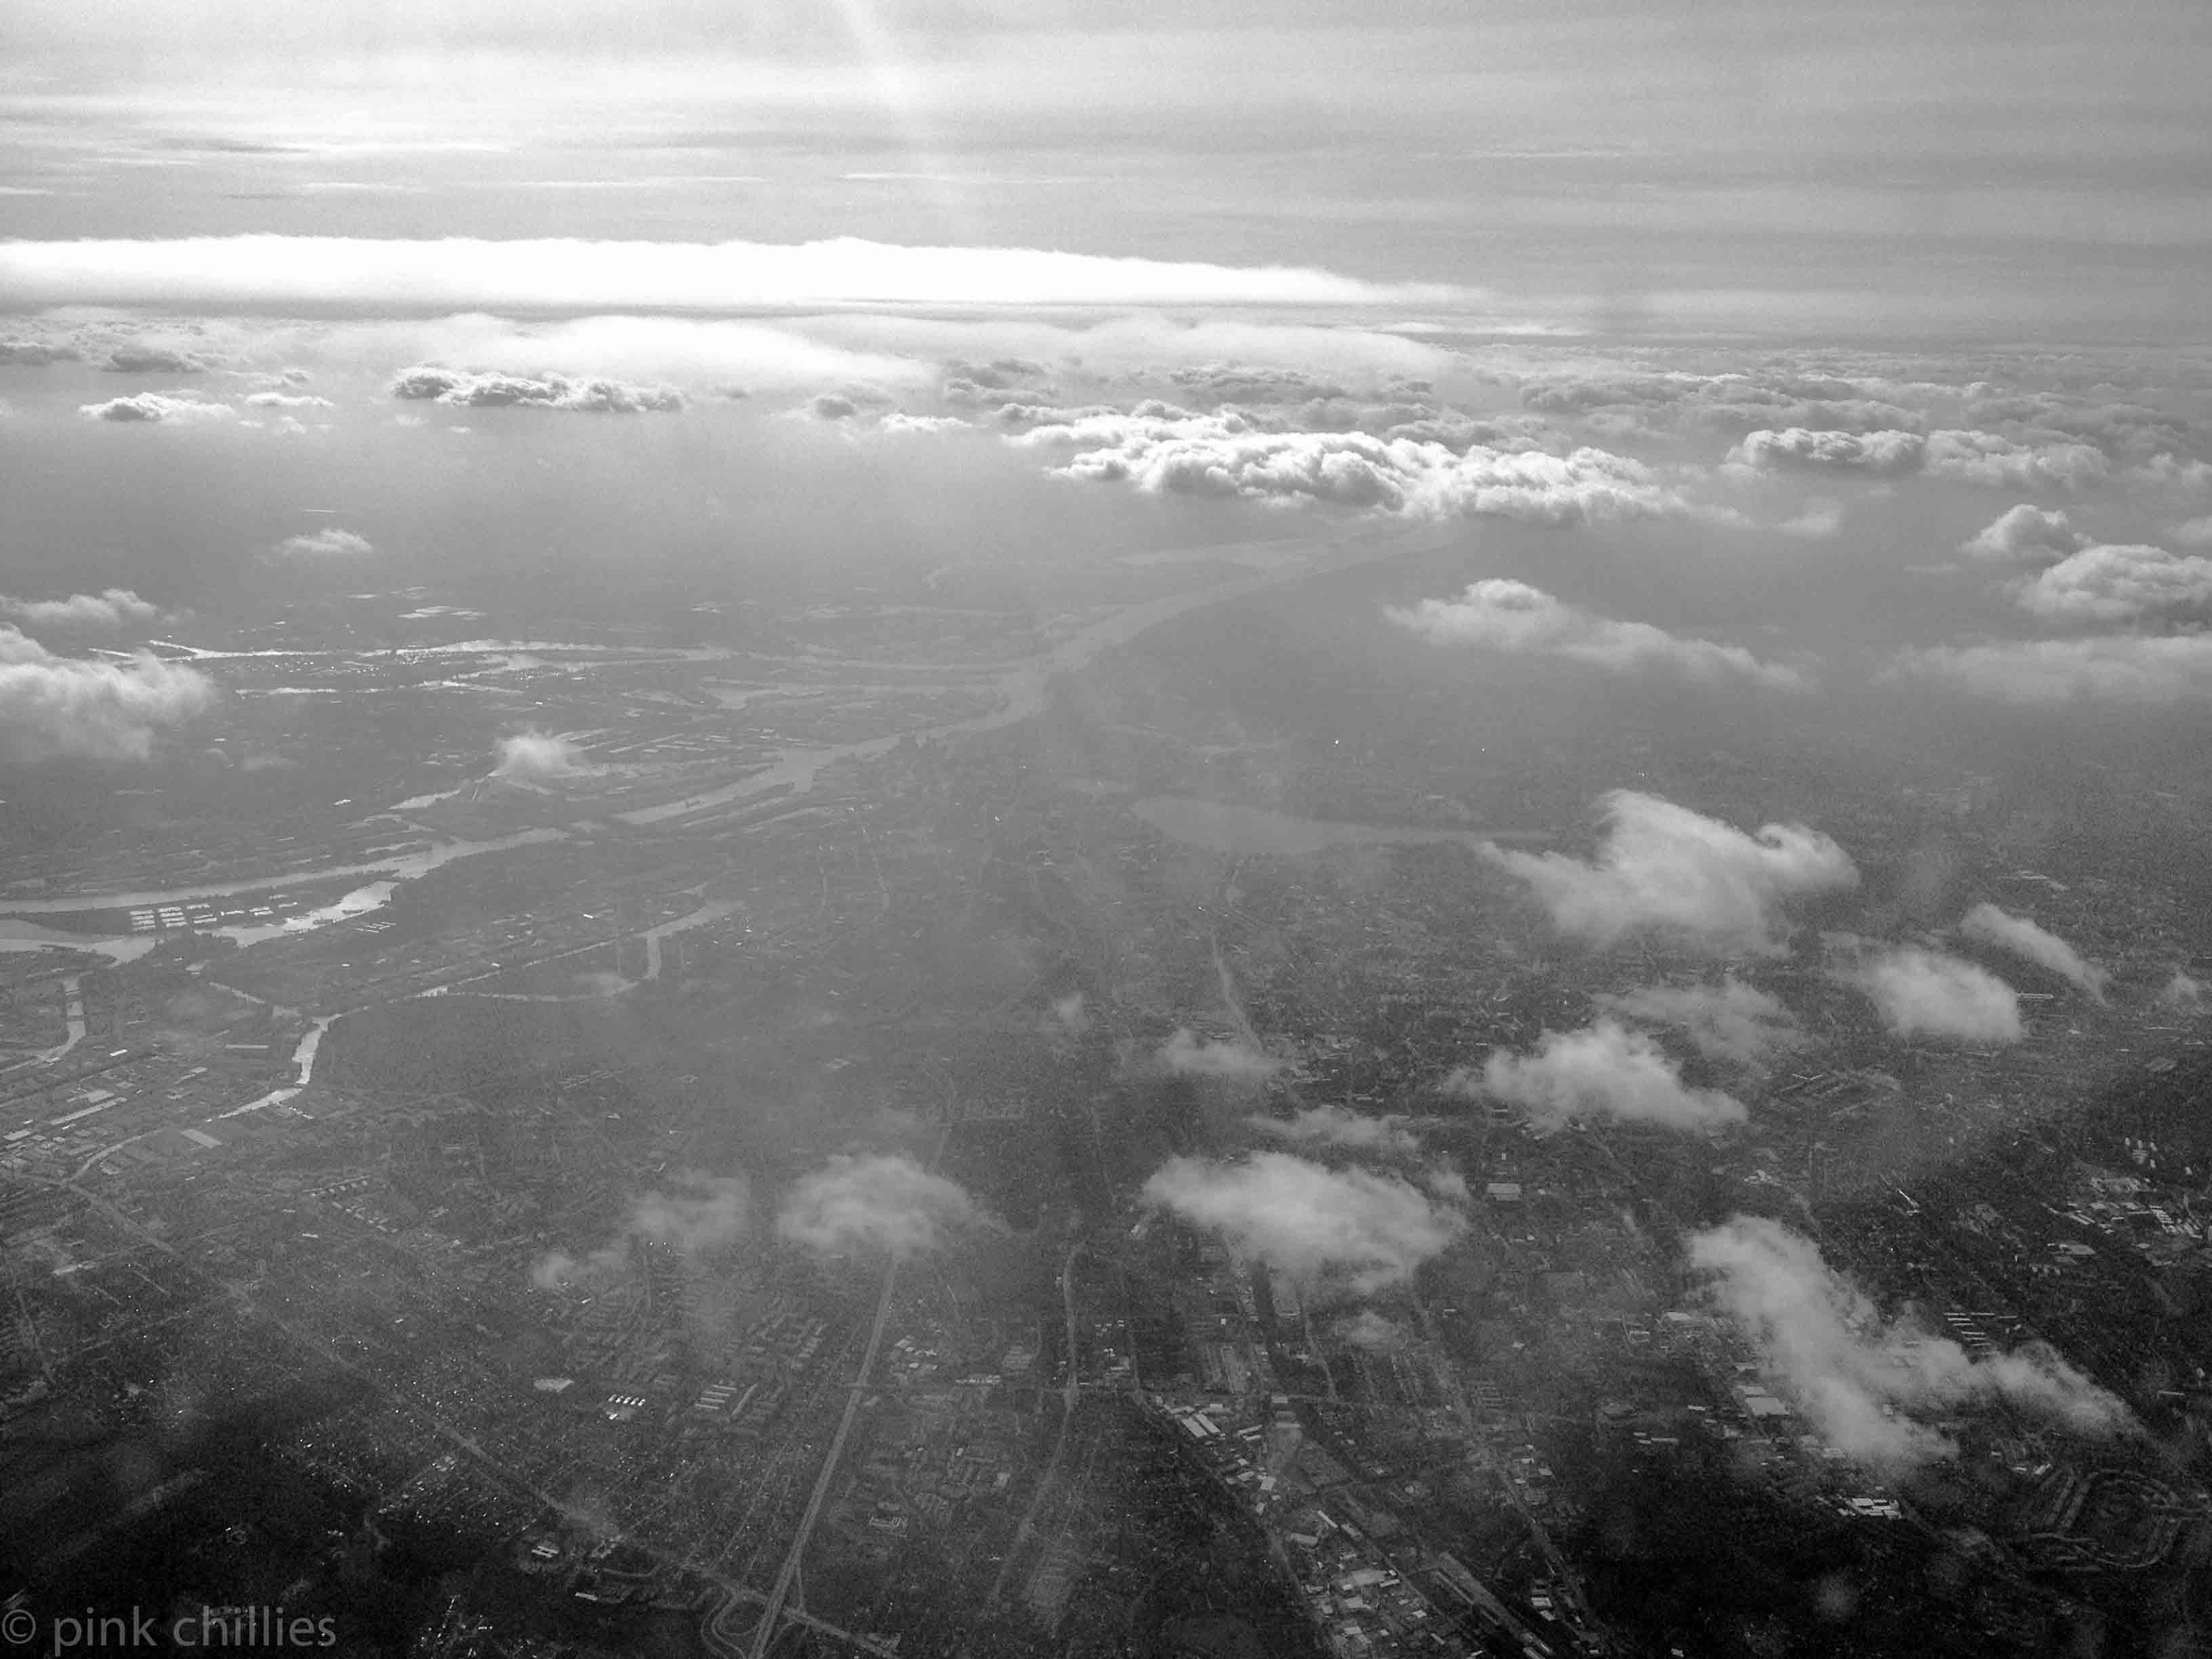 IMG_5550Anflug auf HAmburg